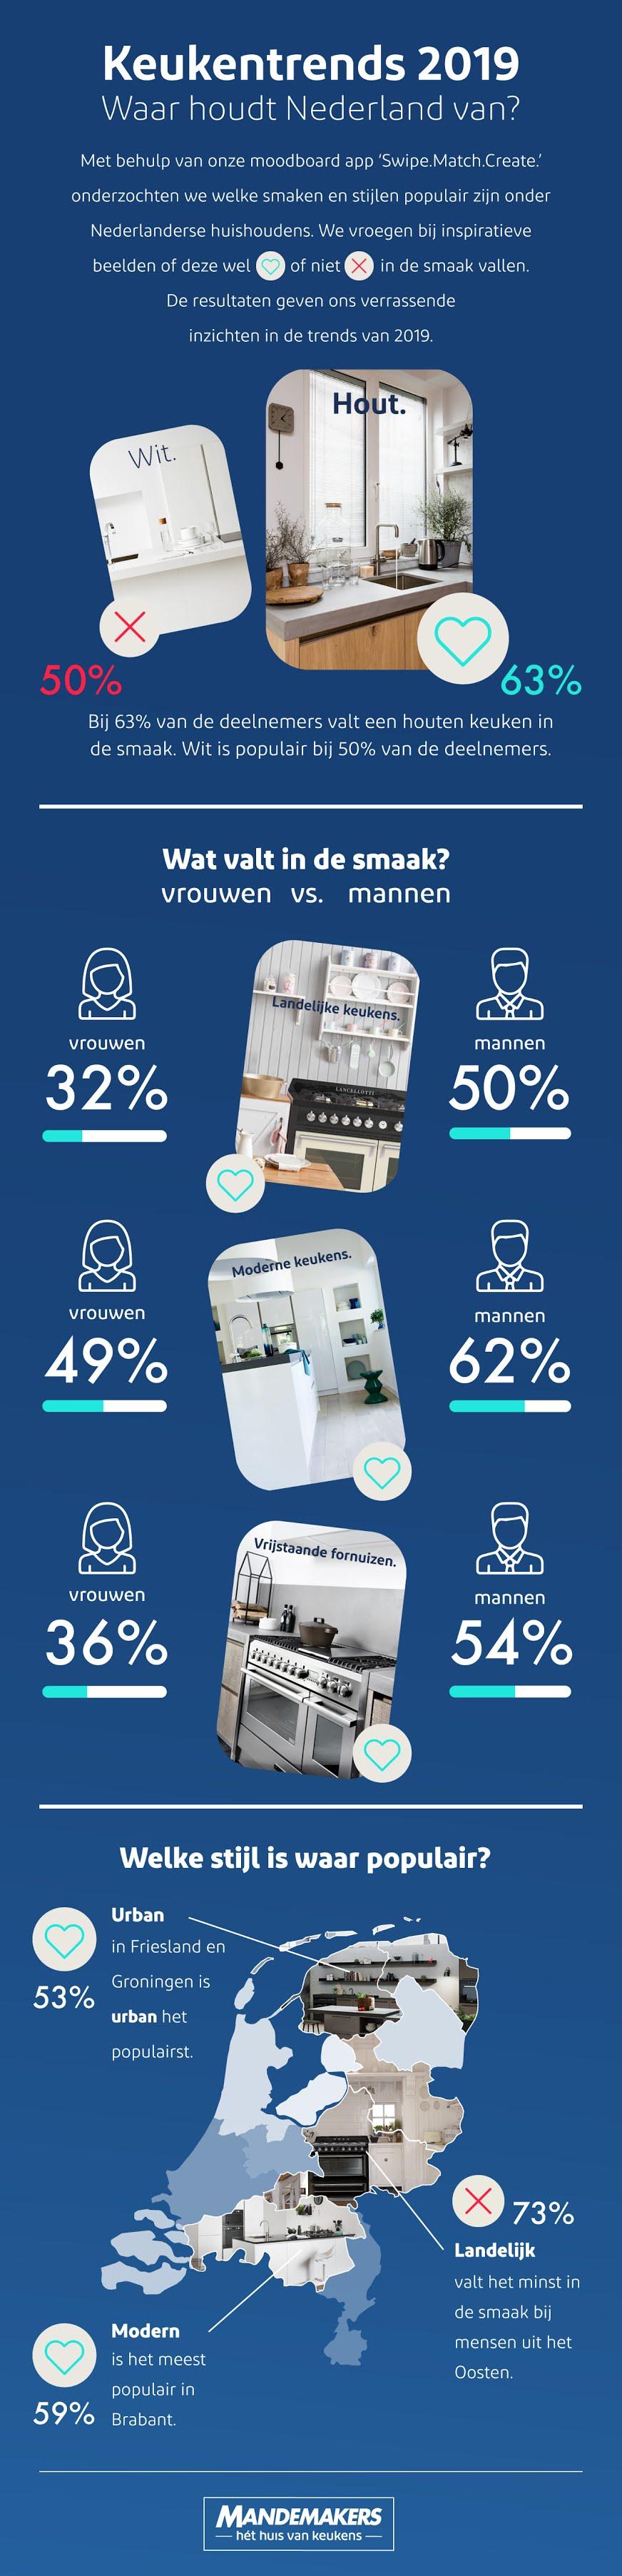 Infographic: Keukentrends 2019